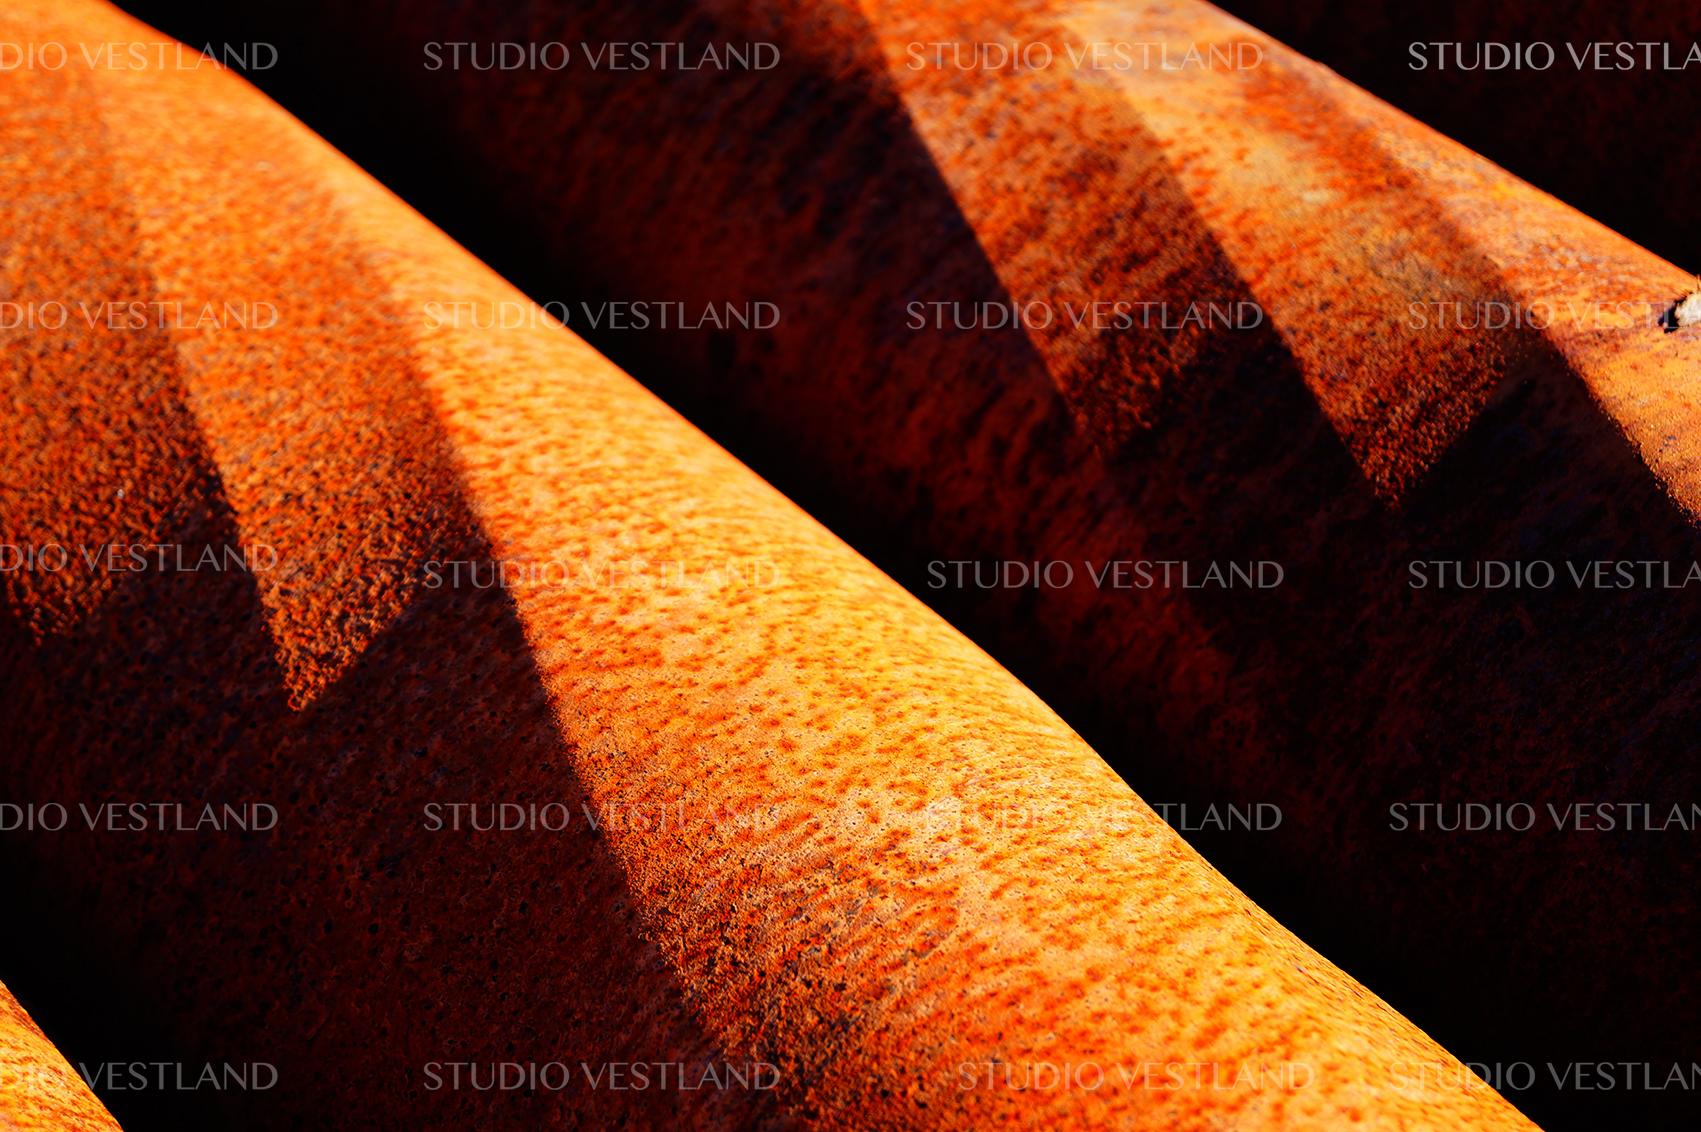 Studio Vestland - Rør 11